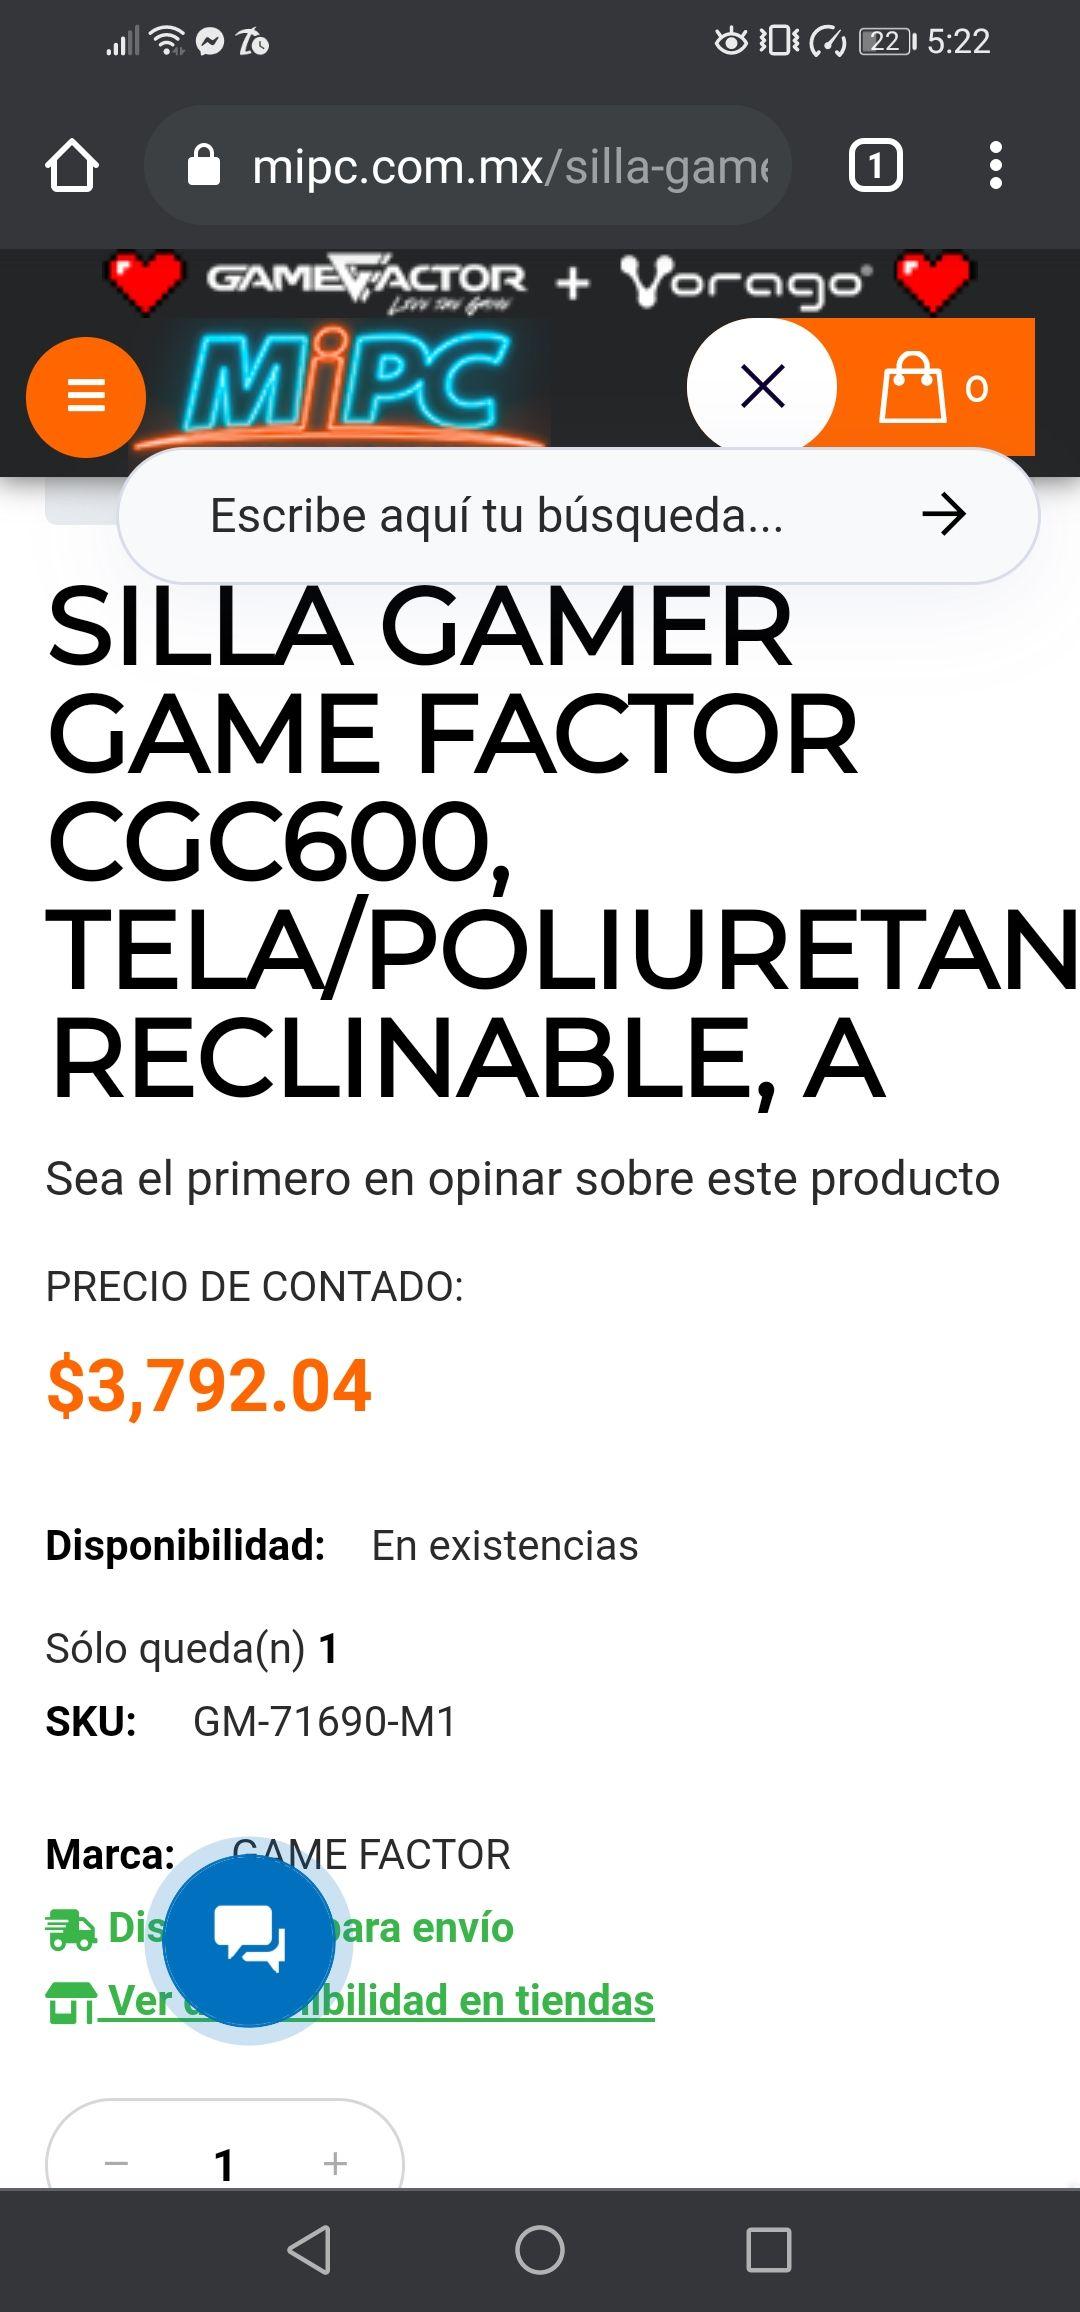 Mipc: Silla gamer gamer factor CGC600